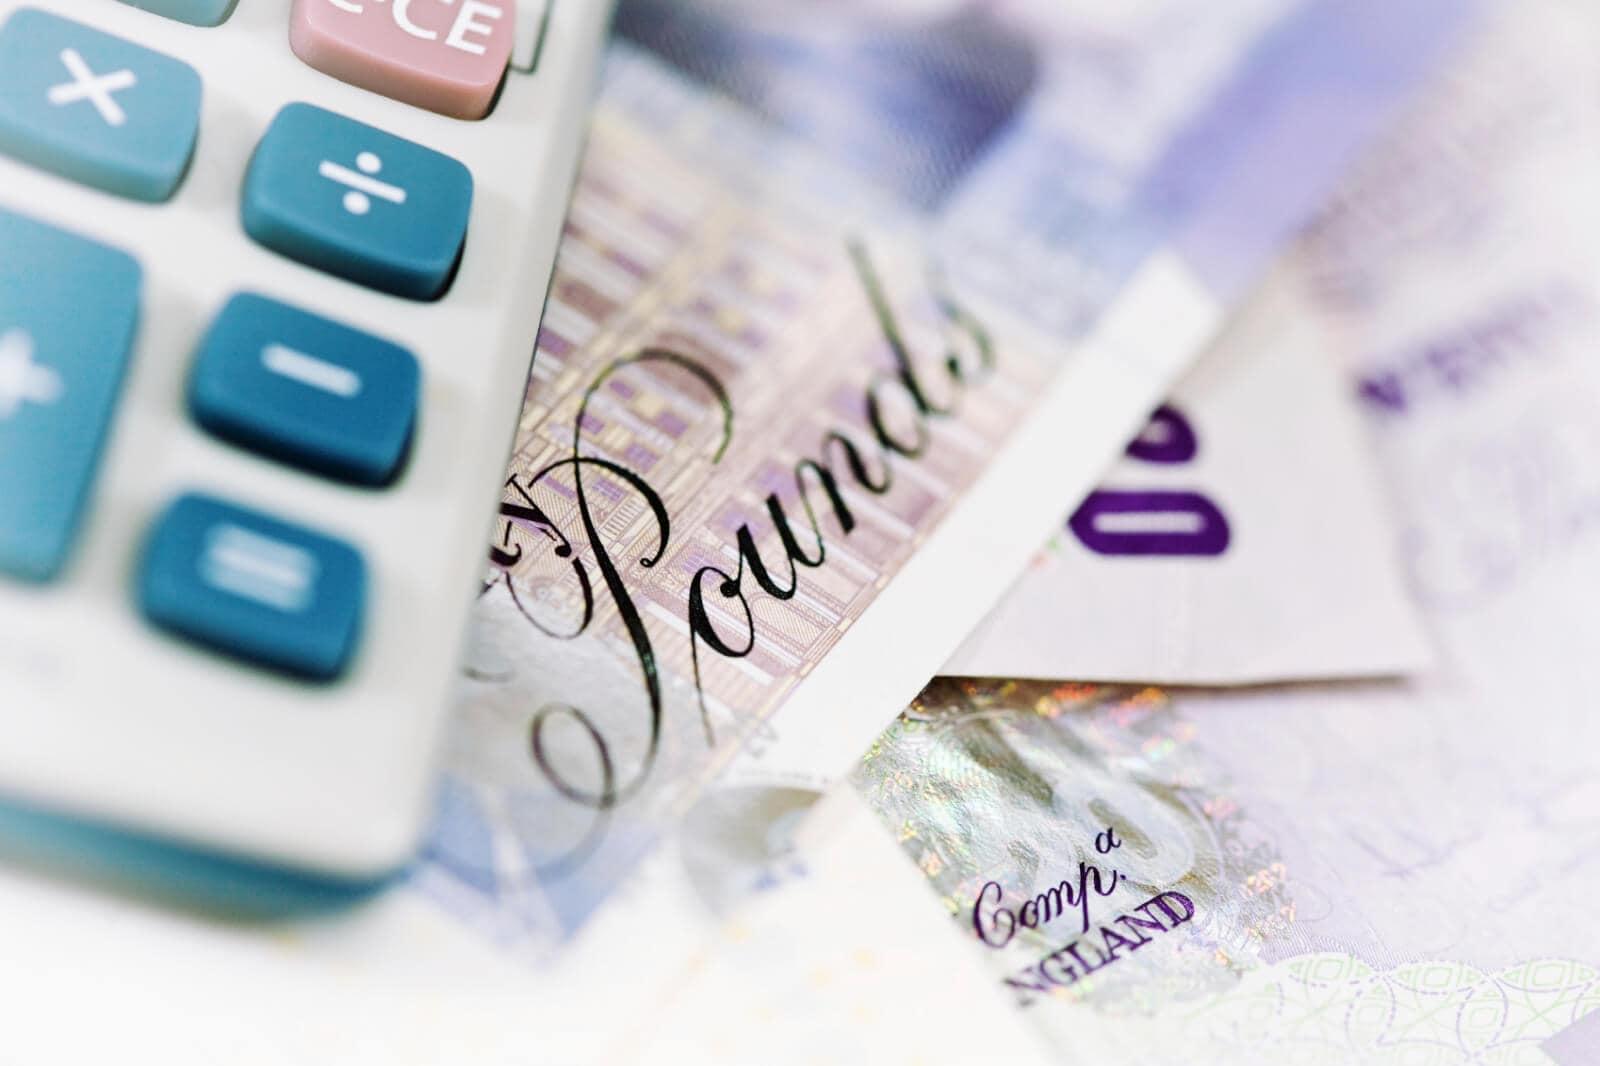 Currency and Calculator - iStock_000004142949_Medium